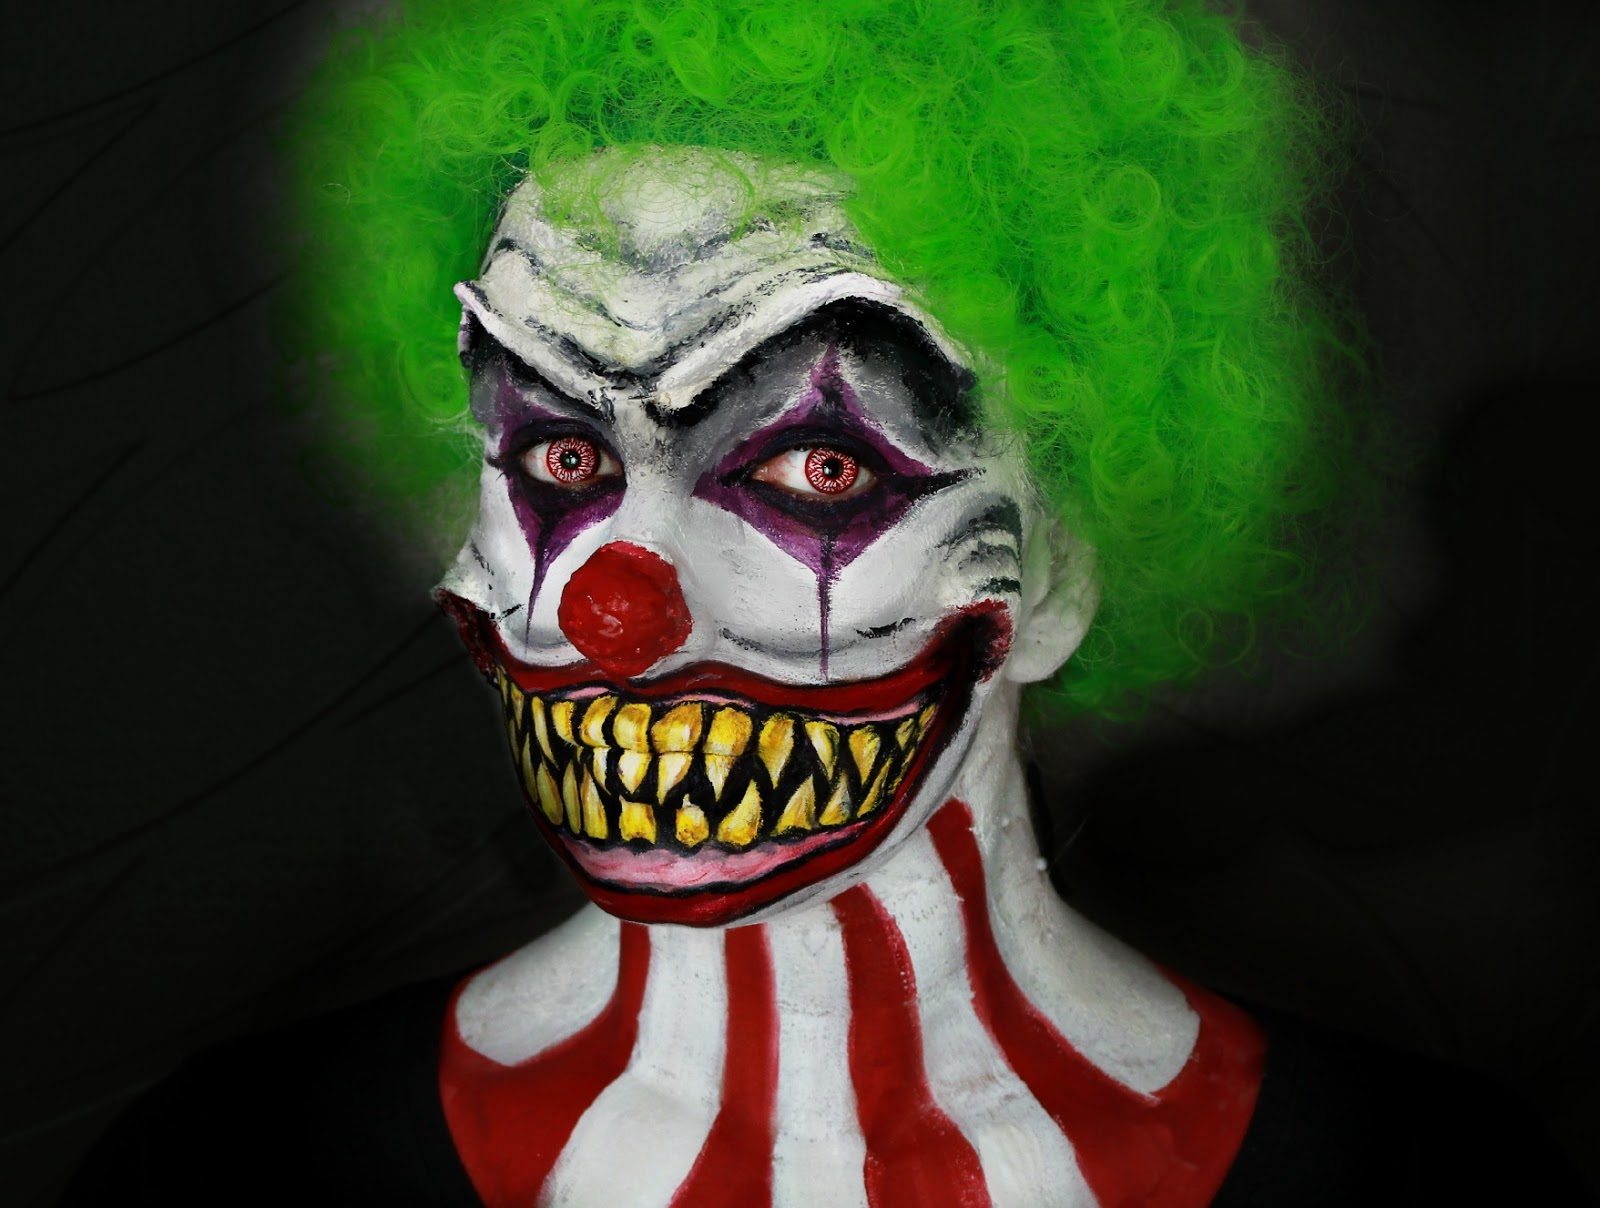 maquillage halloween clown gentil. Black Bedroom Furniture Sets. Home Design Ideas